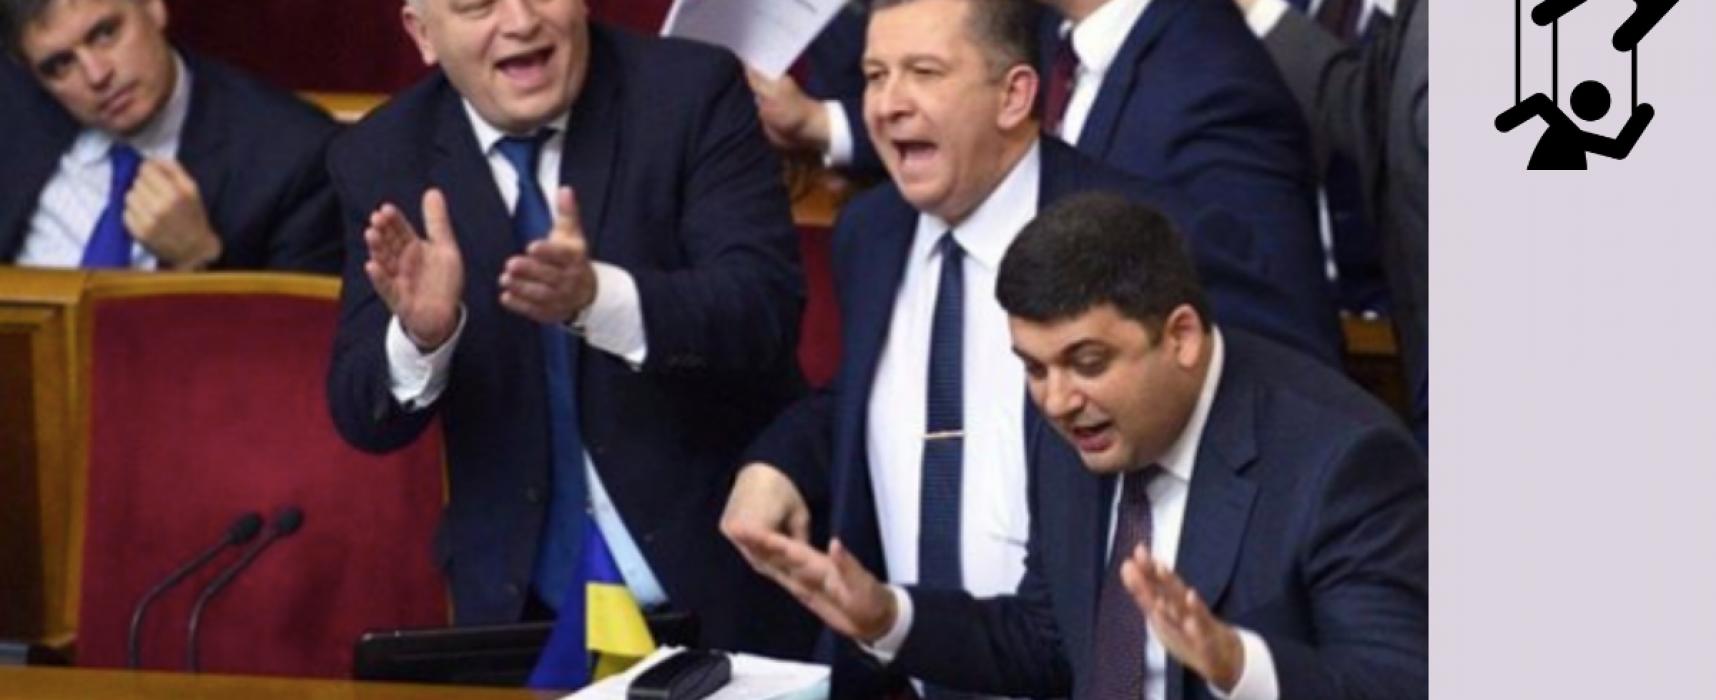 Fake: La Verkhovna Rada d'Ukraine a autorisé la vente de produits périmés